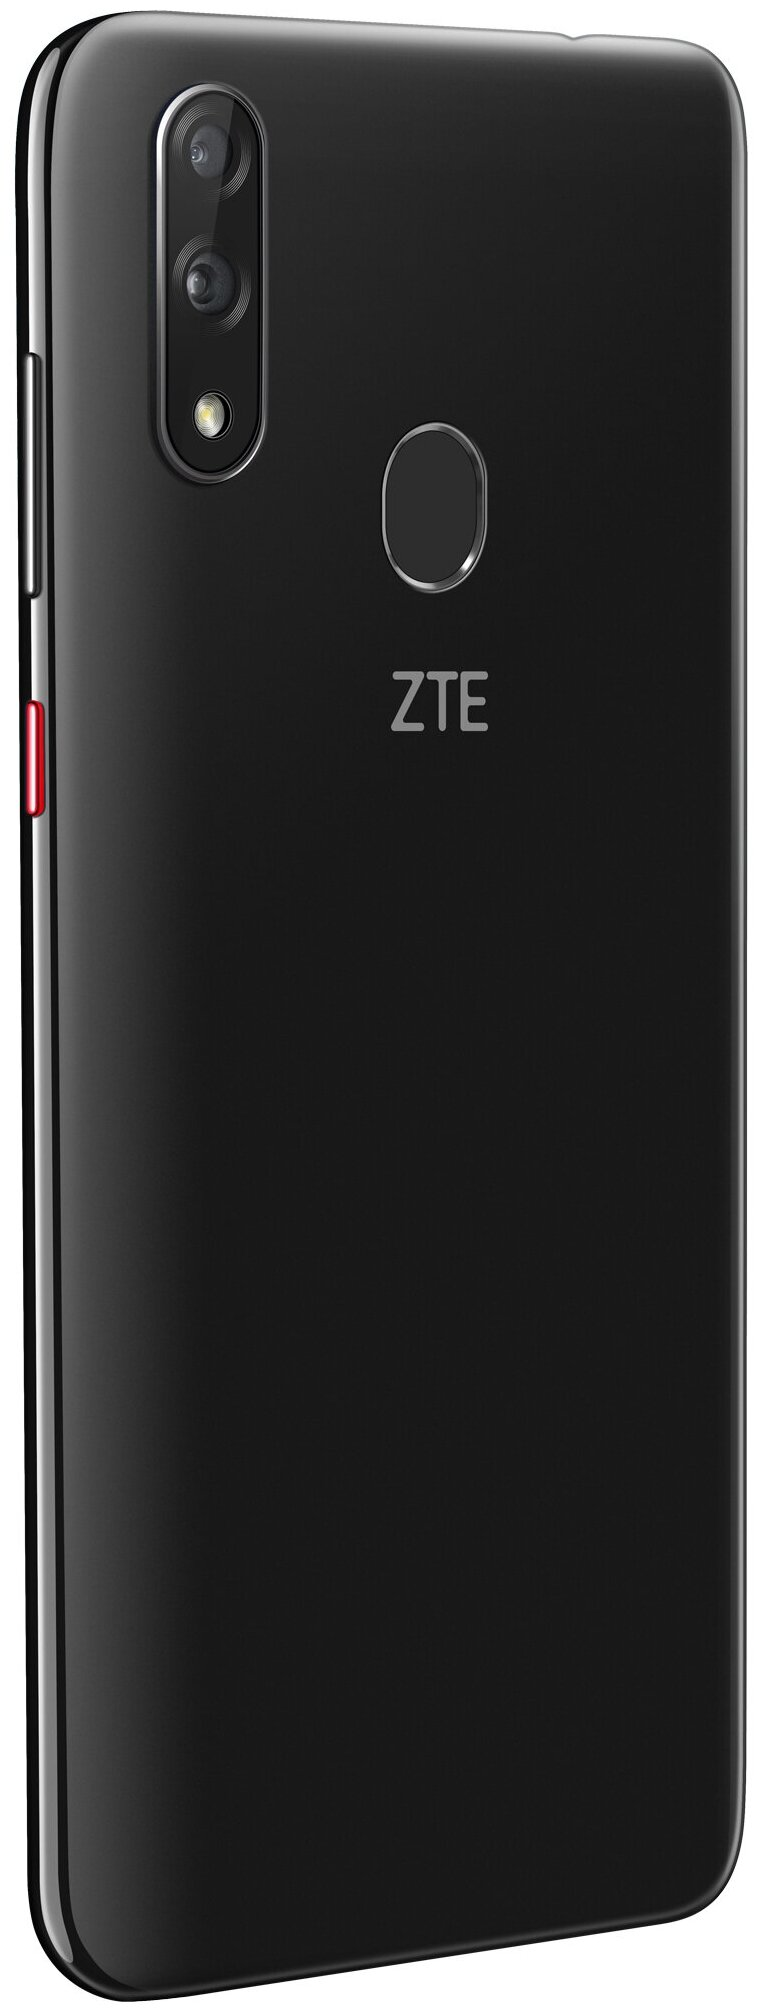 ZTE Blade V10 - память: 64ГБ, слот для карты памяти